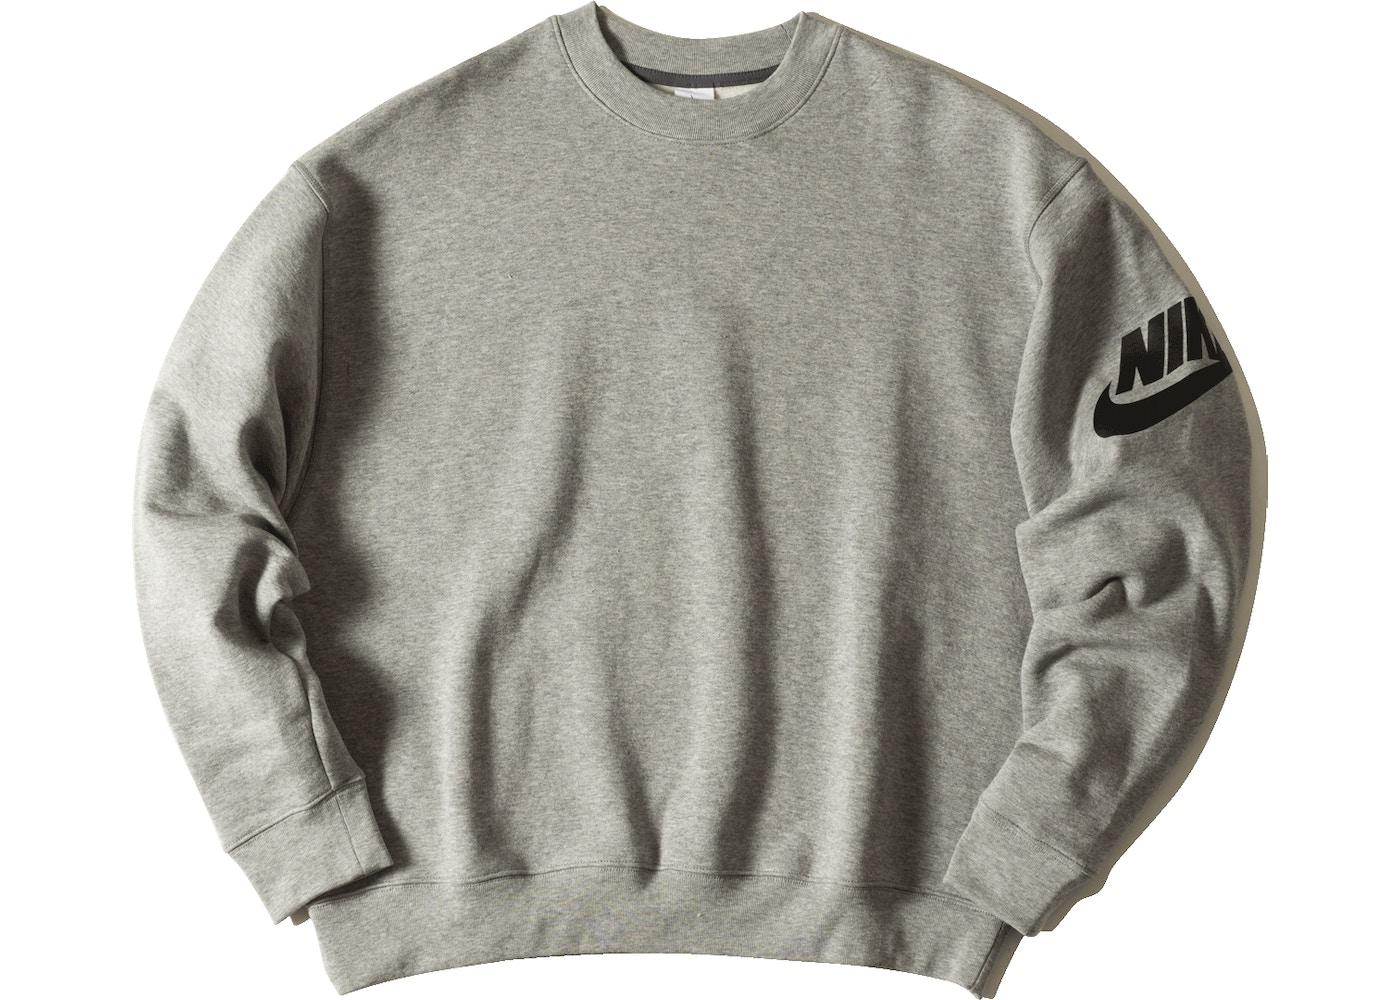 db13fb63f8e Buy   Sell FEAR OF GOD Streetwear